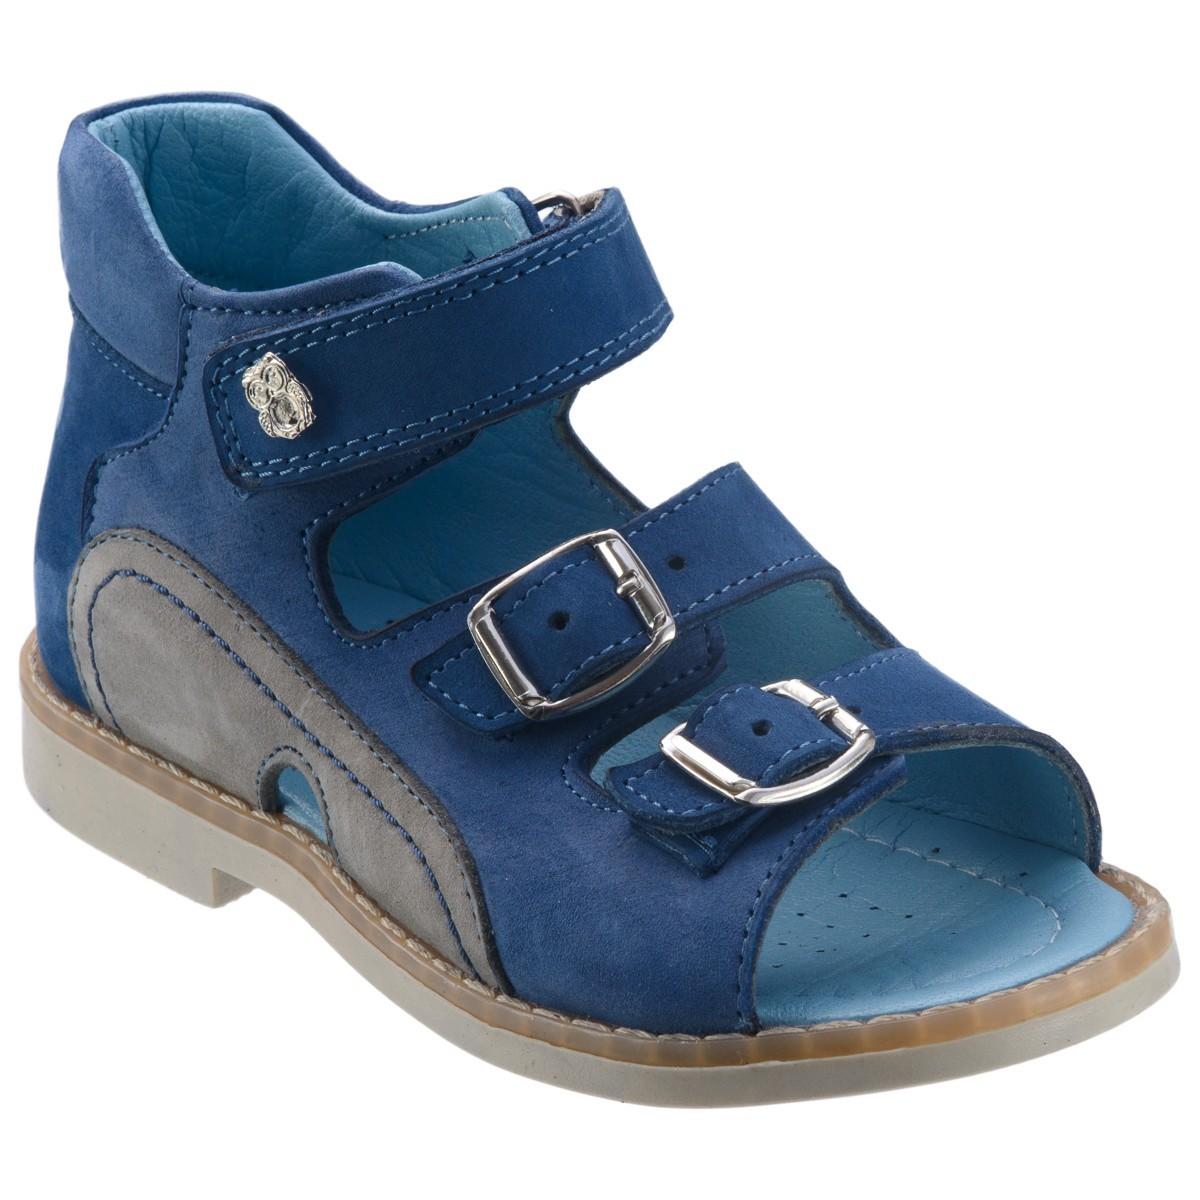 ᐈ Ортопедичне Взуття - купити в інтернет-магазині Орто-Лайн 1f455a9a7c901